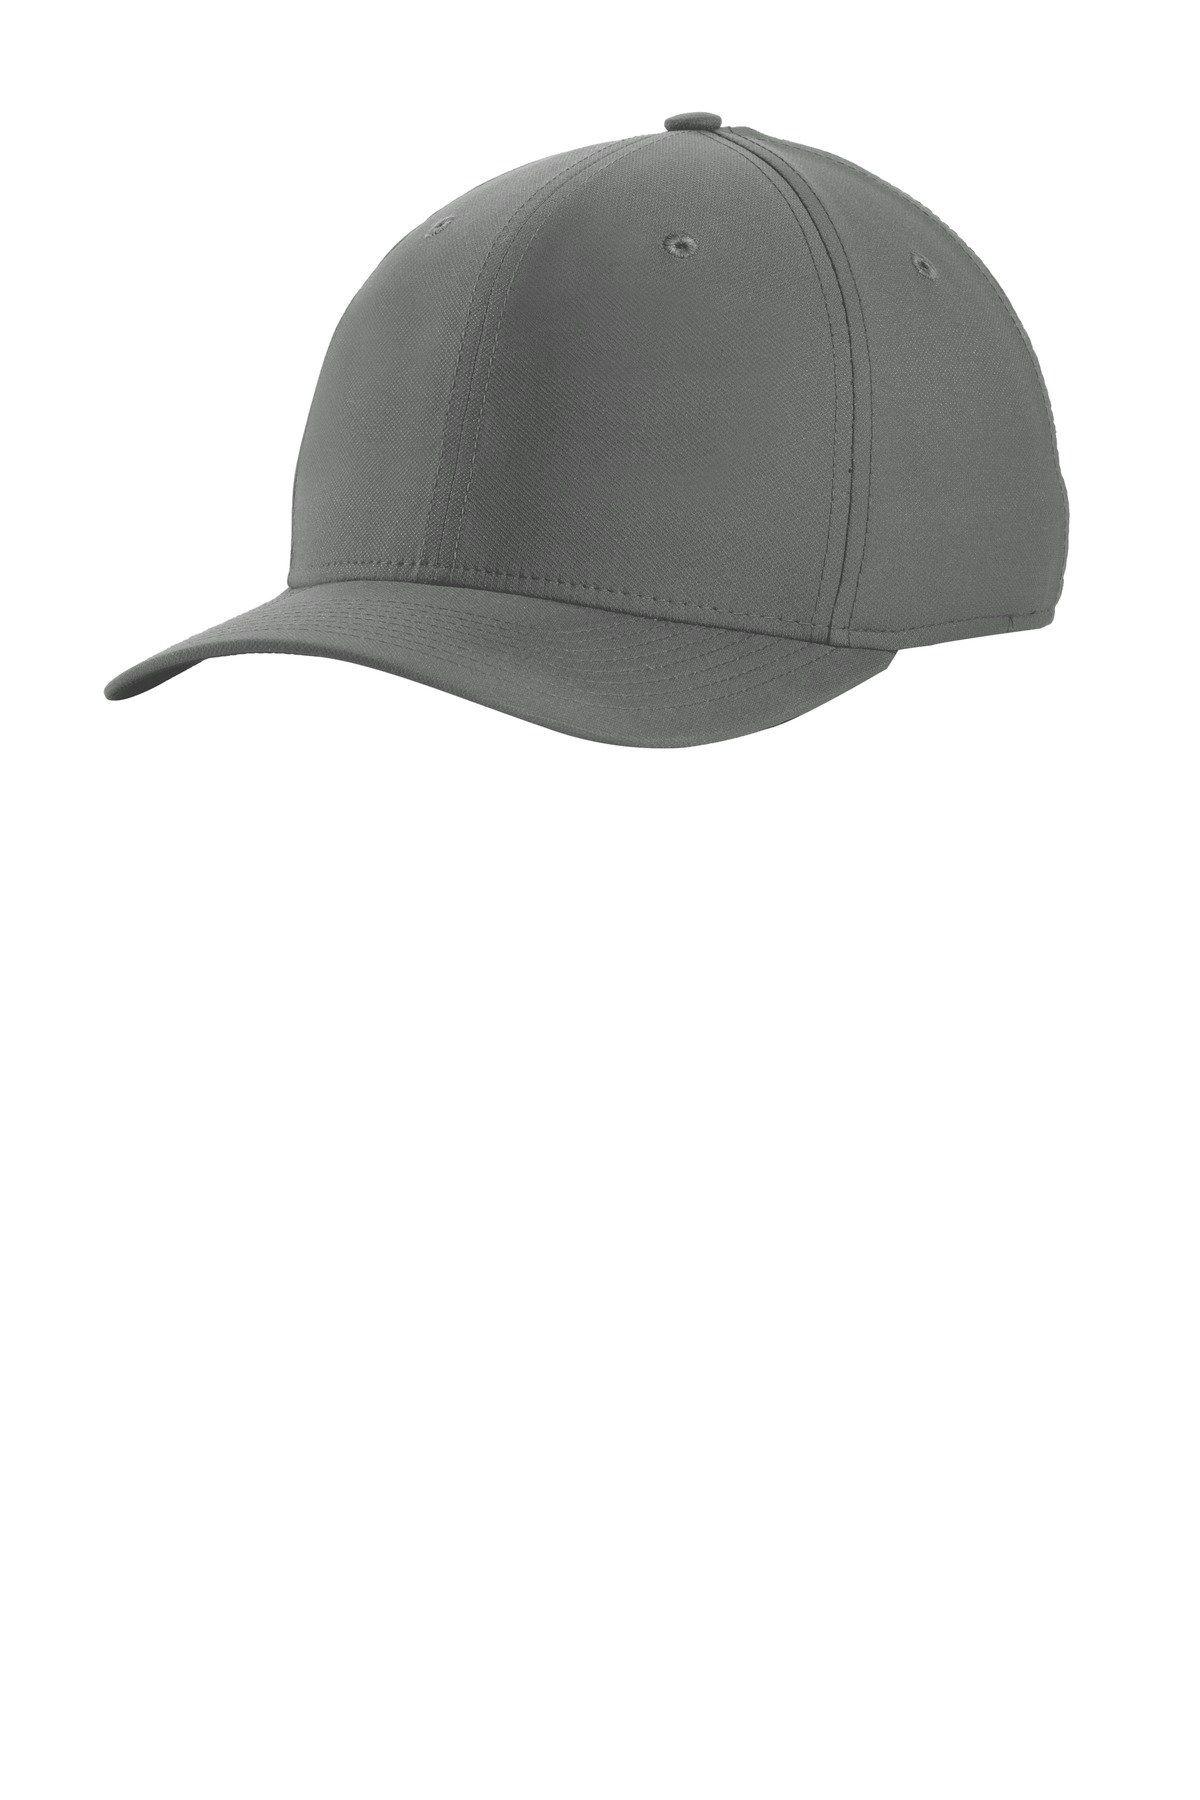 Nike Dri-FIT Classic 99 Cap NKAA1860 Dark Grey  White Dobby Fabric 7200048f2c3